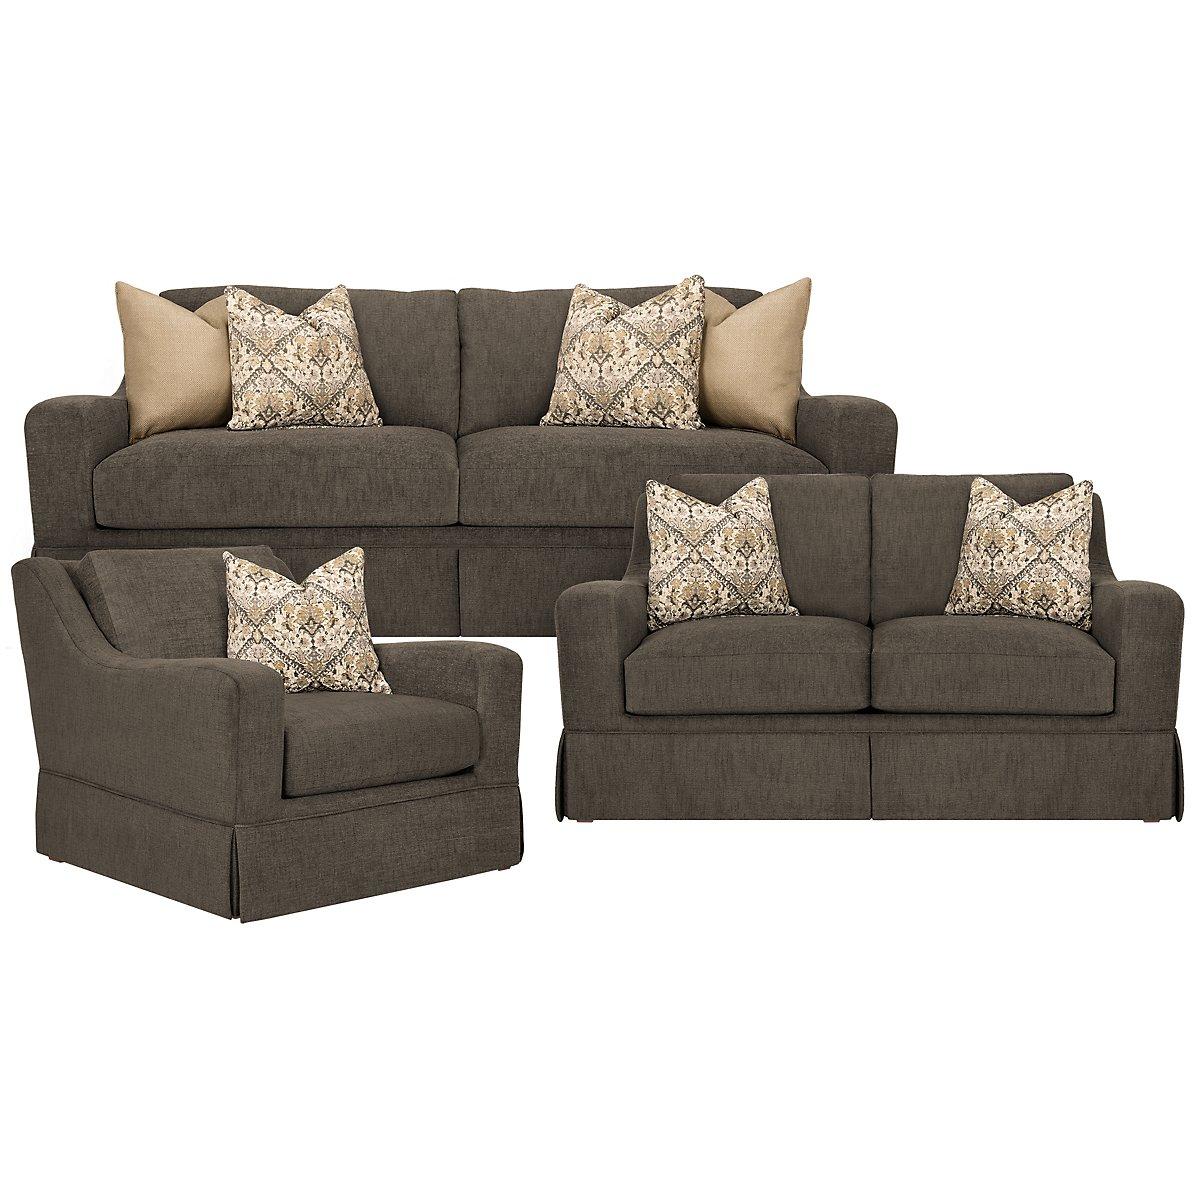 Hallie Dark Gray Fabric Living Room